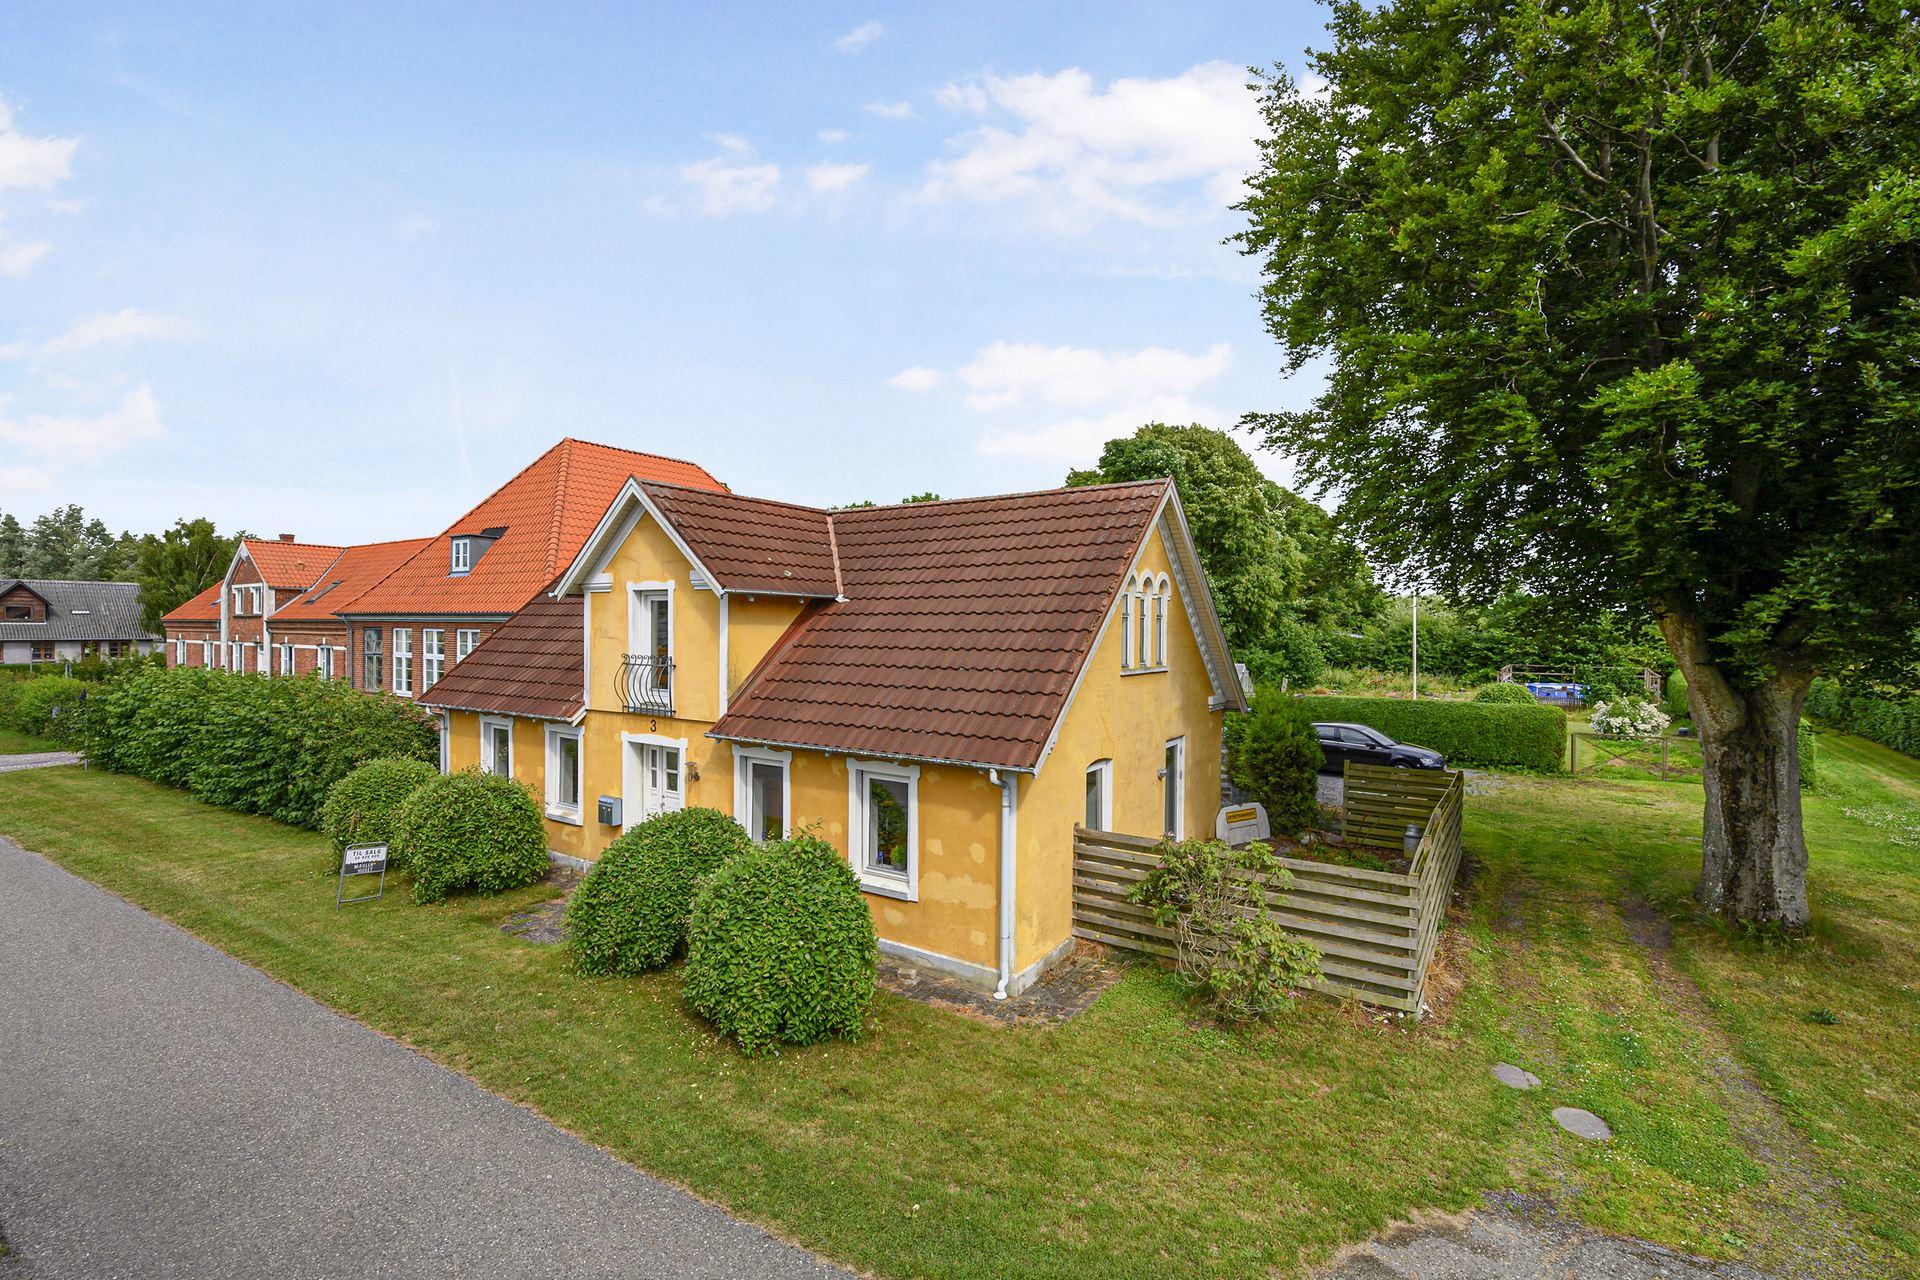 Mejerivej 3, Rørholt, 9330 Dronninglund